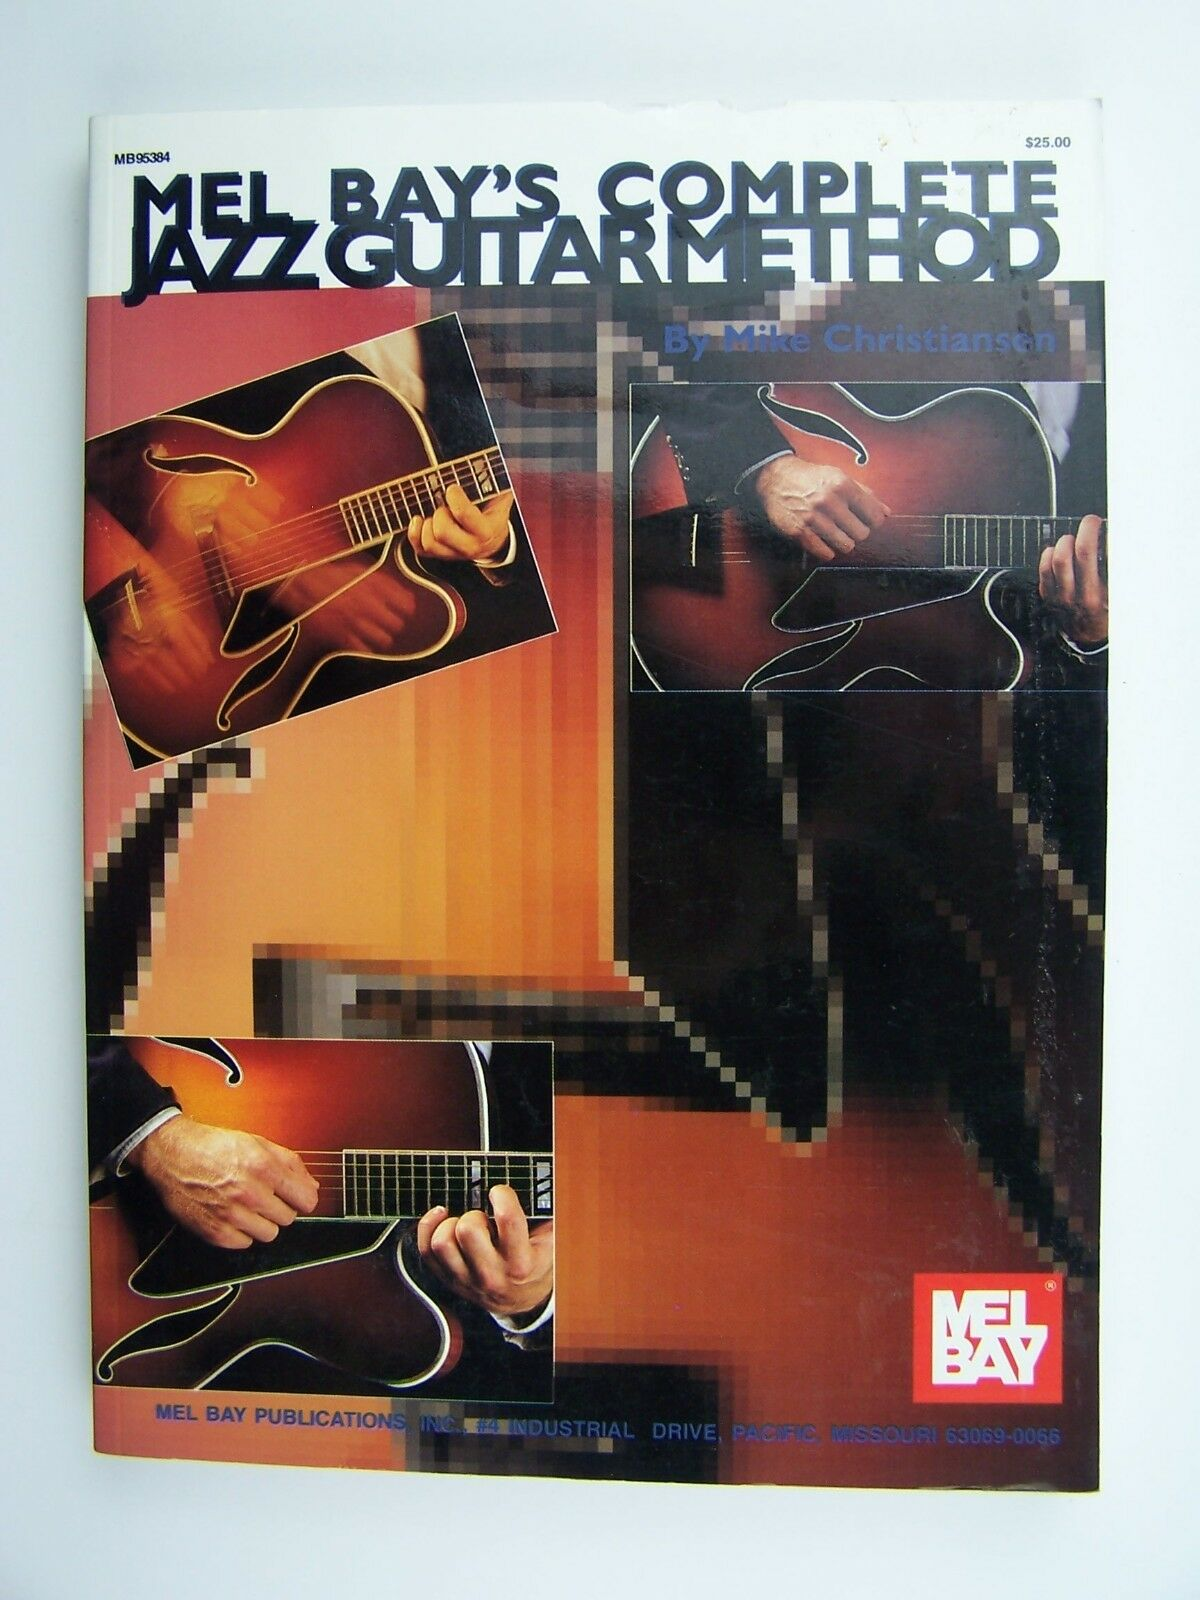 Mel Bay Complete Jazz Guitar Method Paperback by Mike C